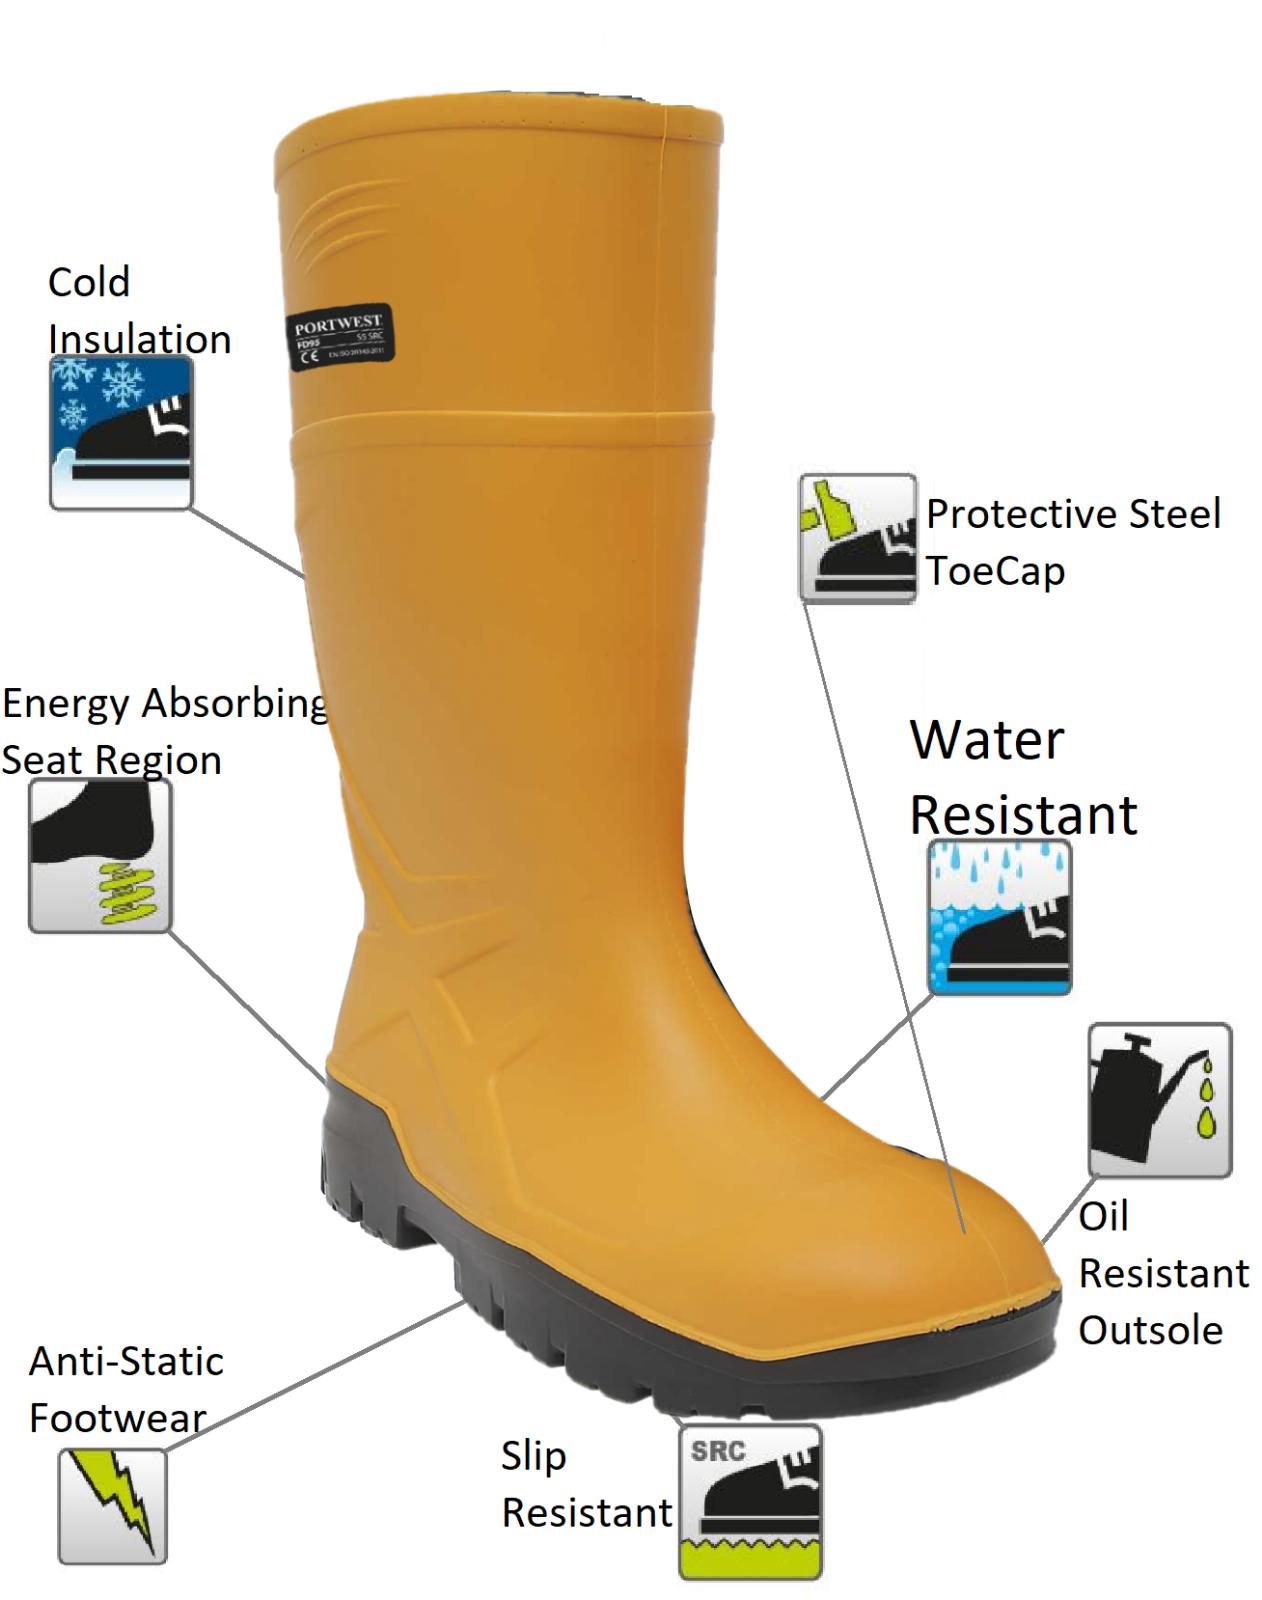 Portwest Wellington Wellies Thermal Lightweight Boots Like Dunlop Purofort FD90